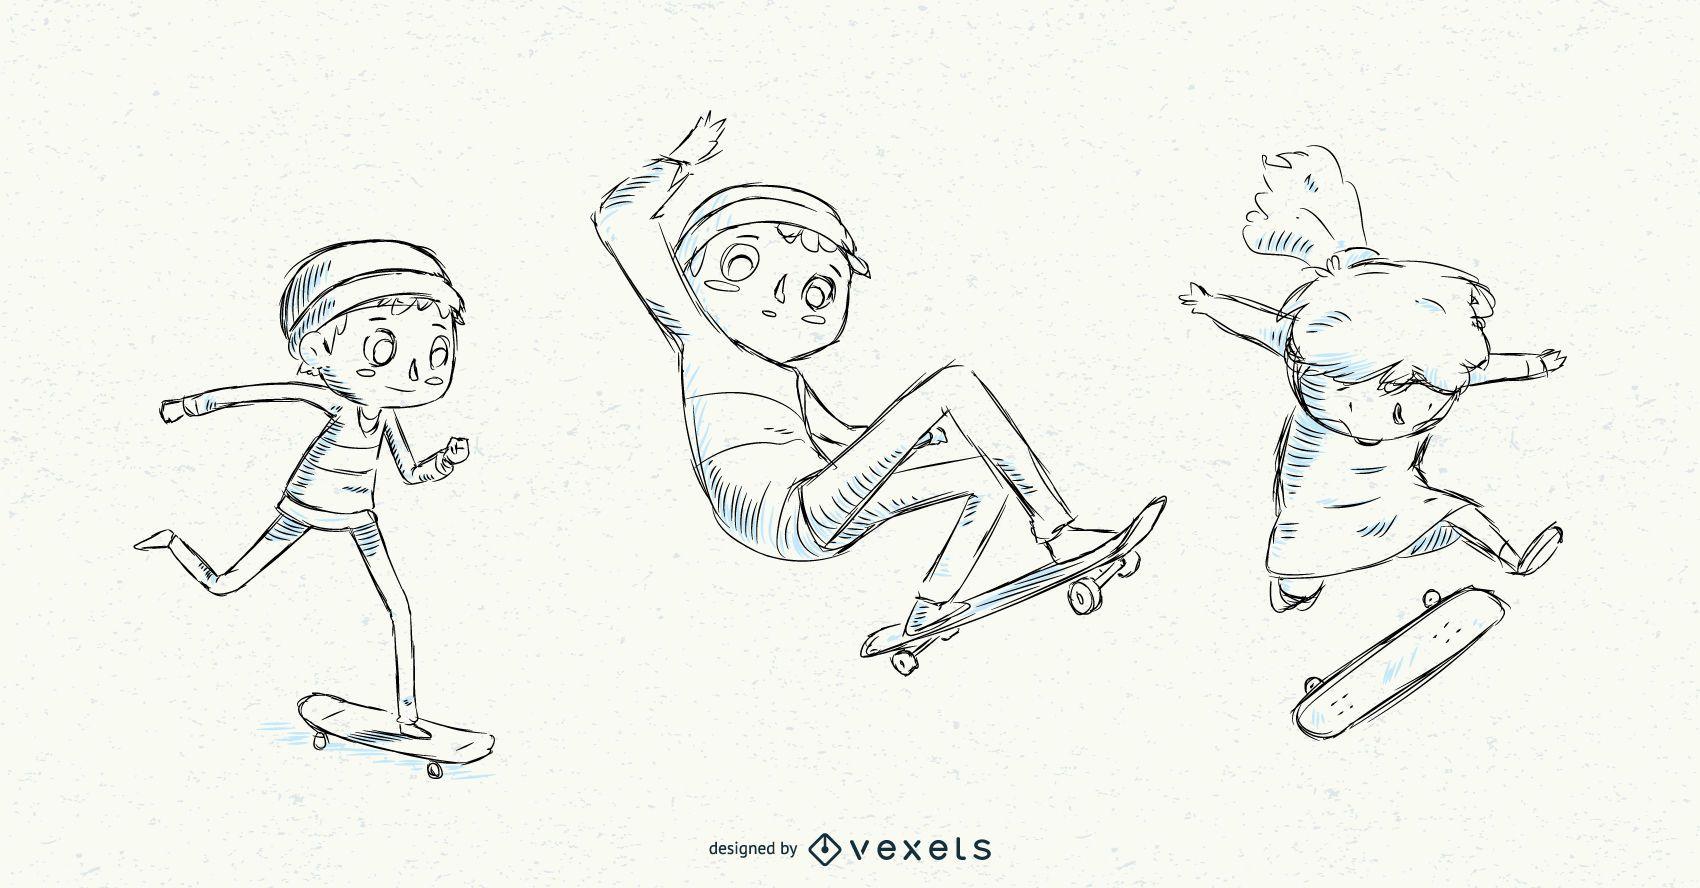 Hand drawn kids skateboarding